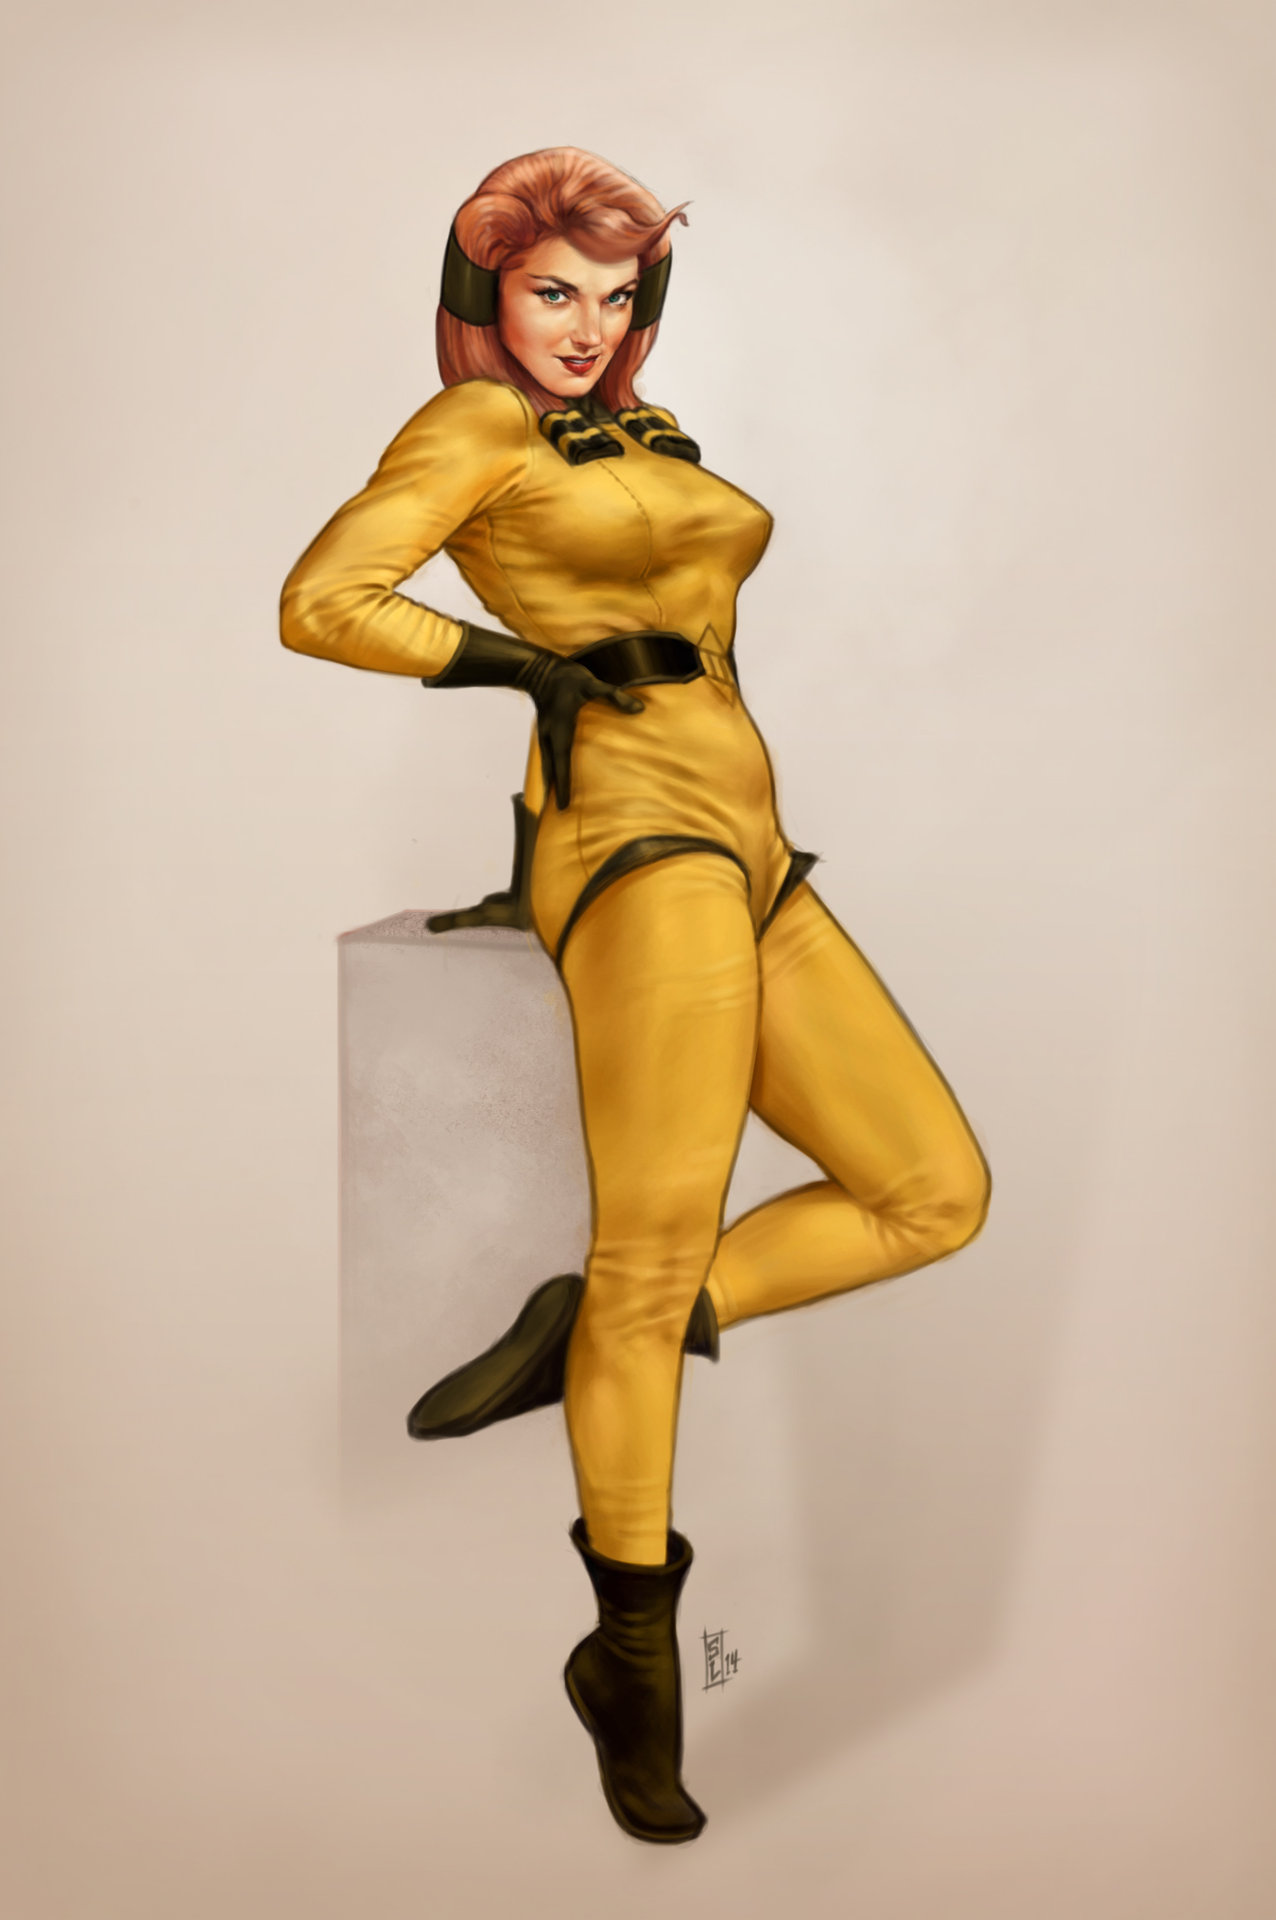 classy-female-superhero-pin-up-art-by-stephen-langmead3